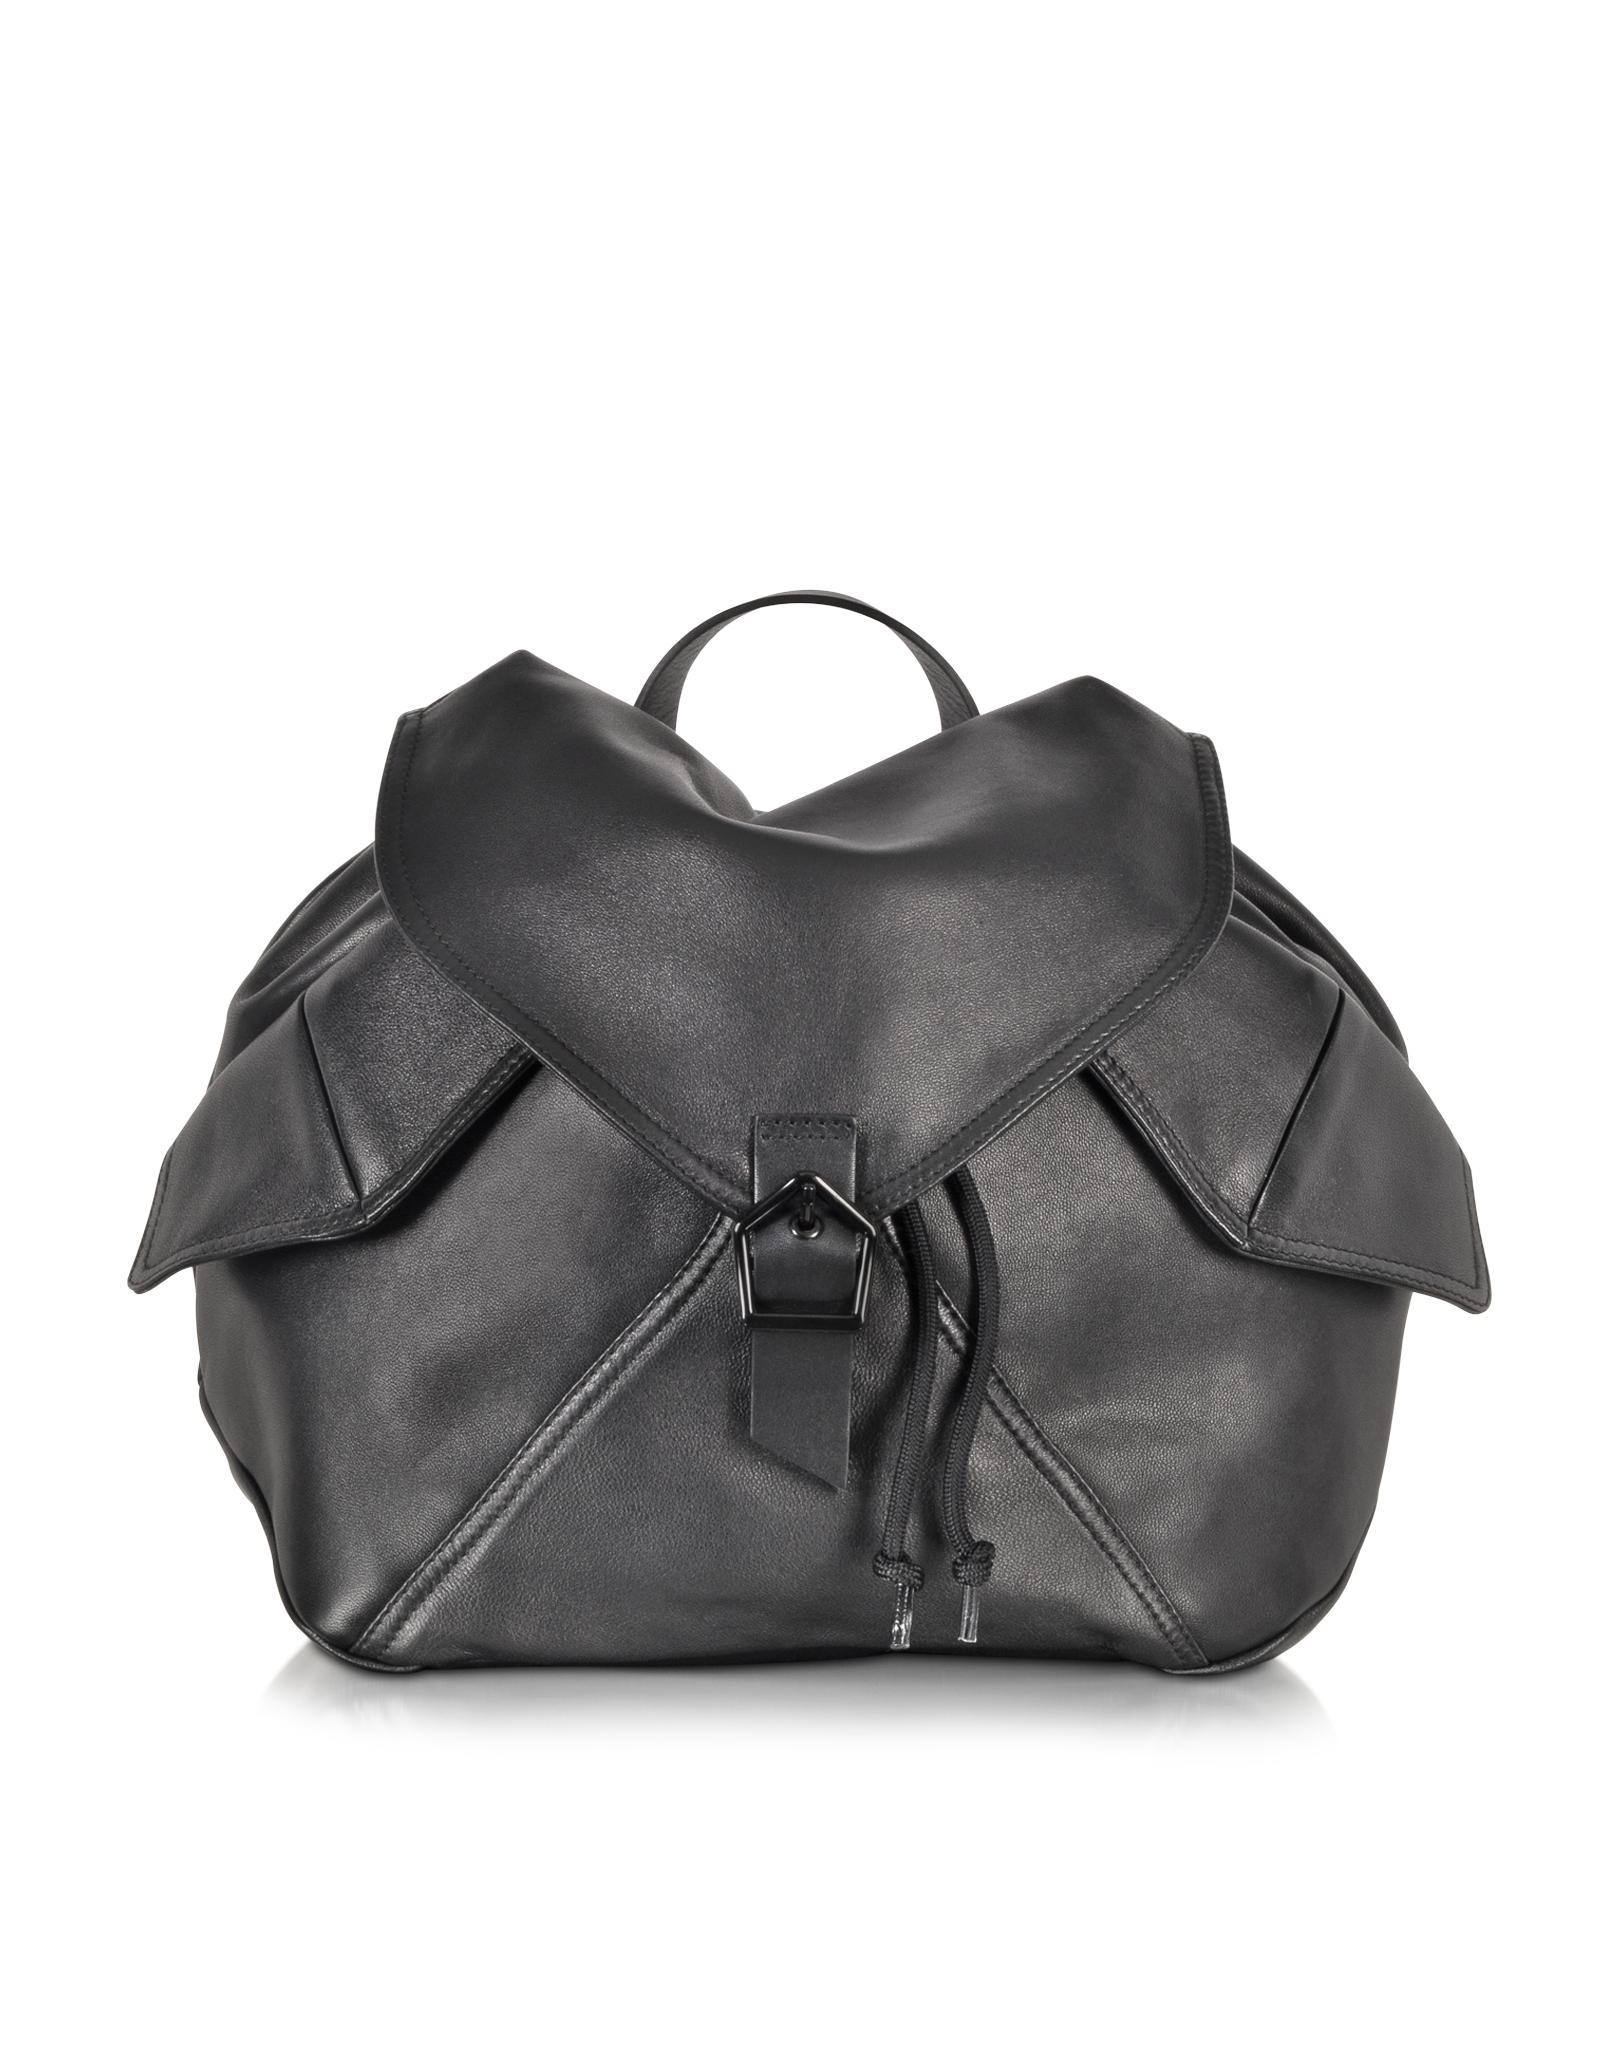 Carven Plain Black Leather Backpack in Black | Lyst